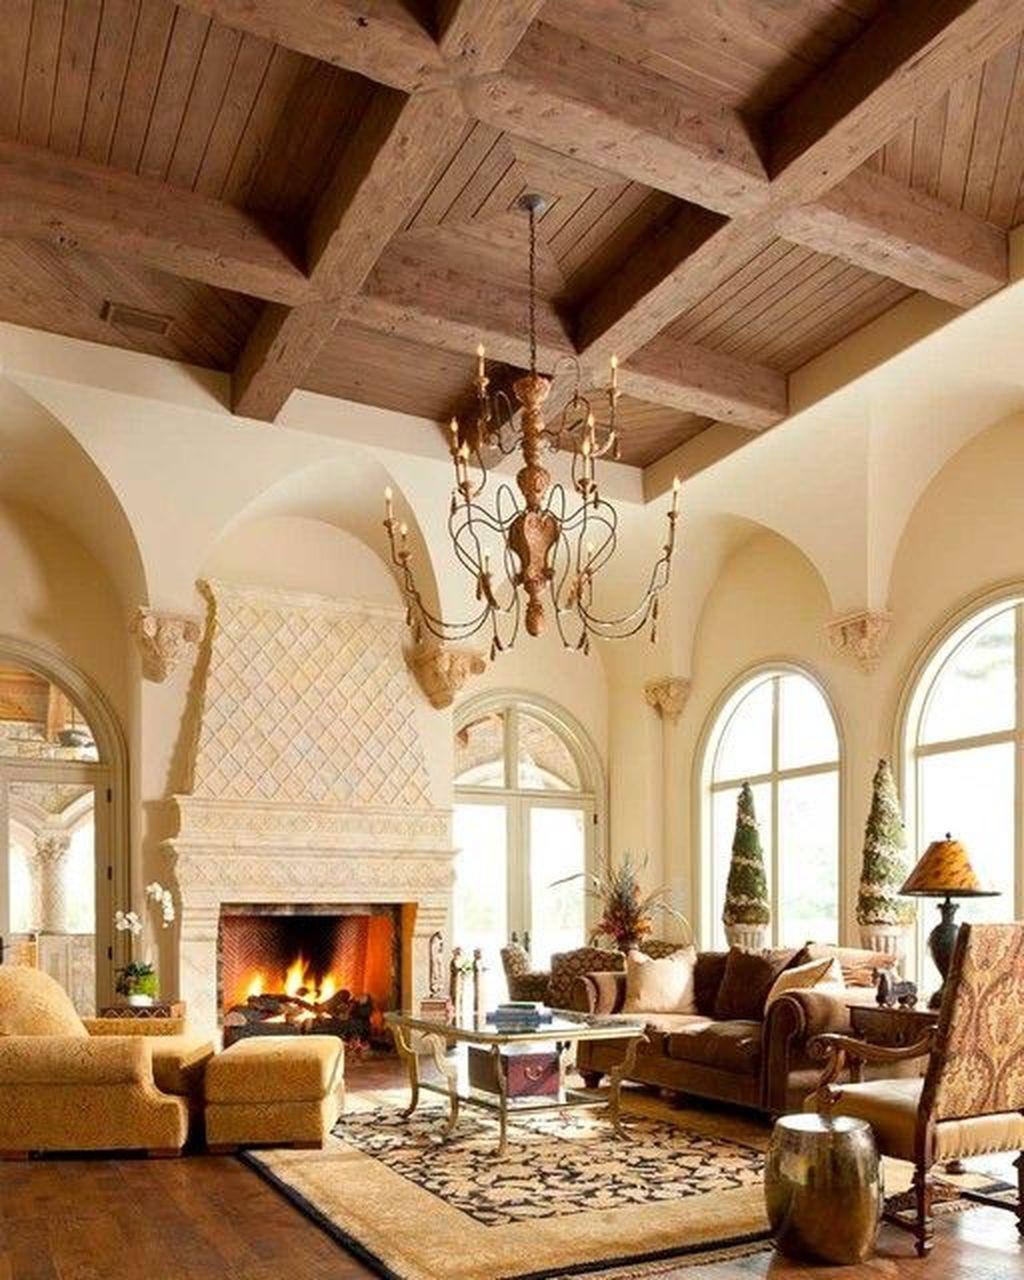 Enjoying Mediterranean Style Design Ideas For Your Home Décor 26